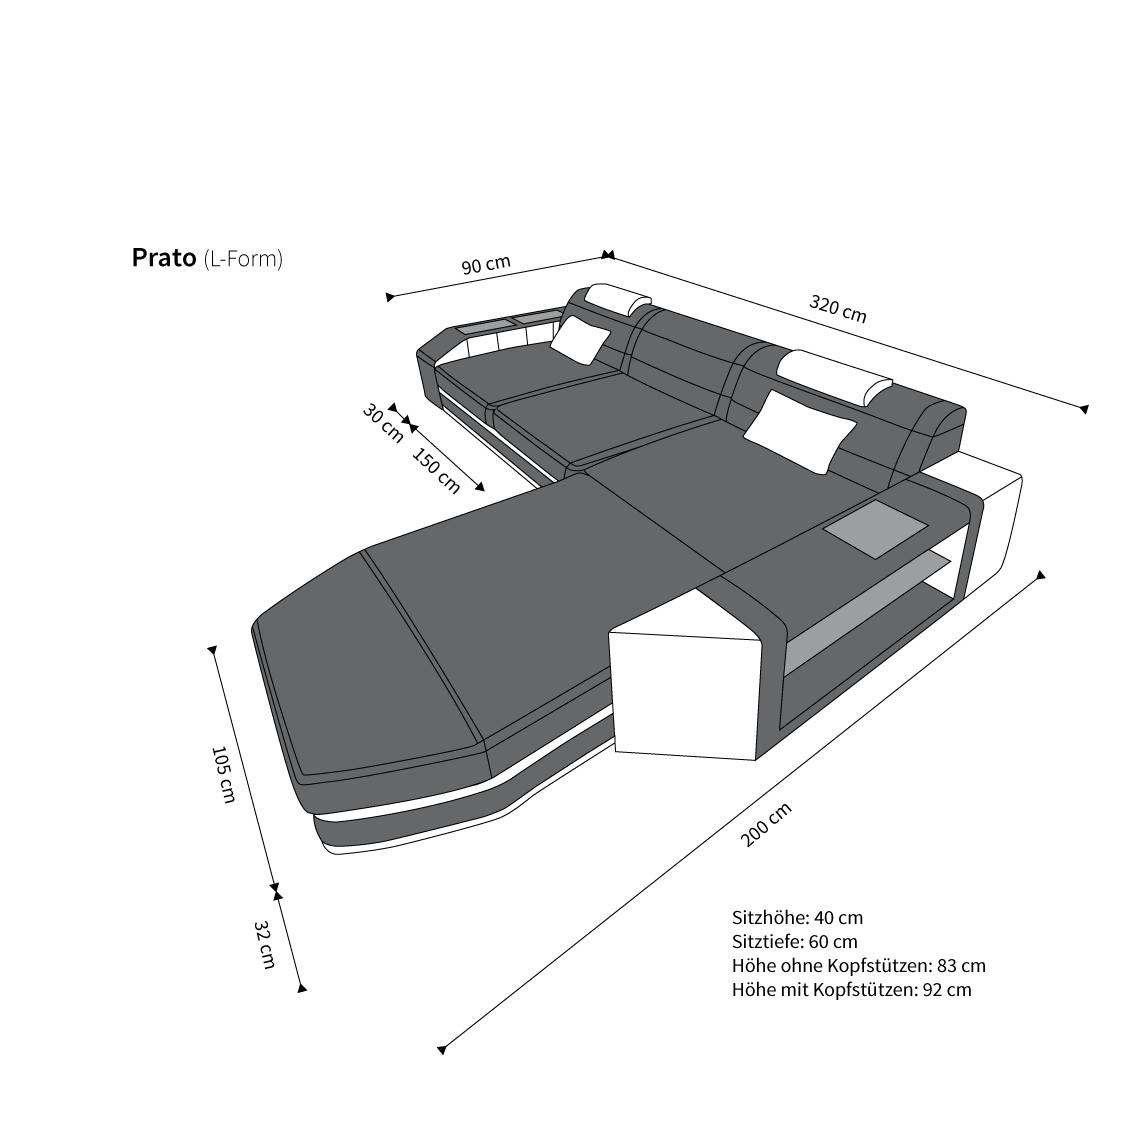 sofas ledersofa ledersofa prato l form grau weiss lagerware g nstig online kaufen. Black Bedroom Furniture Sets. Home Design Ideas